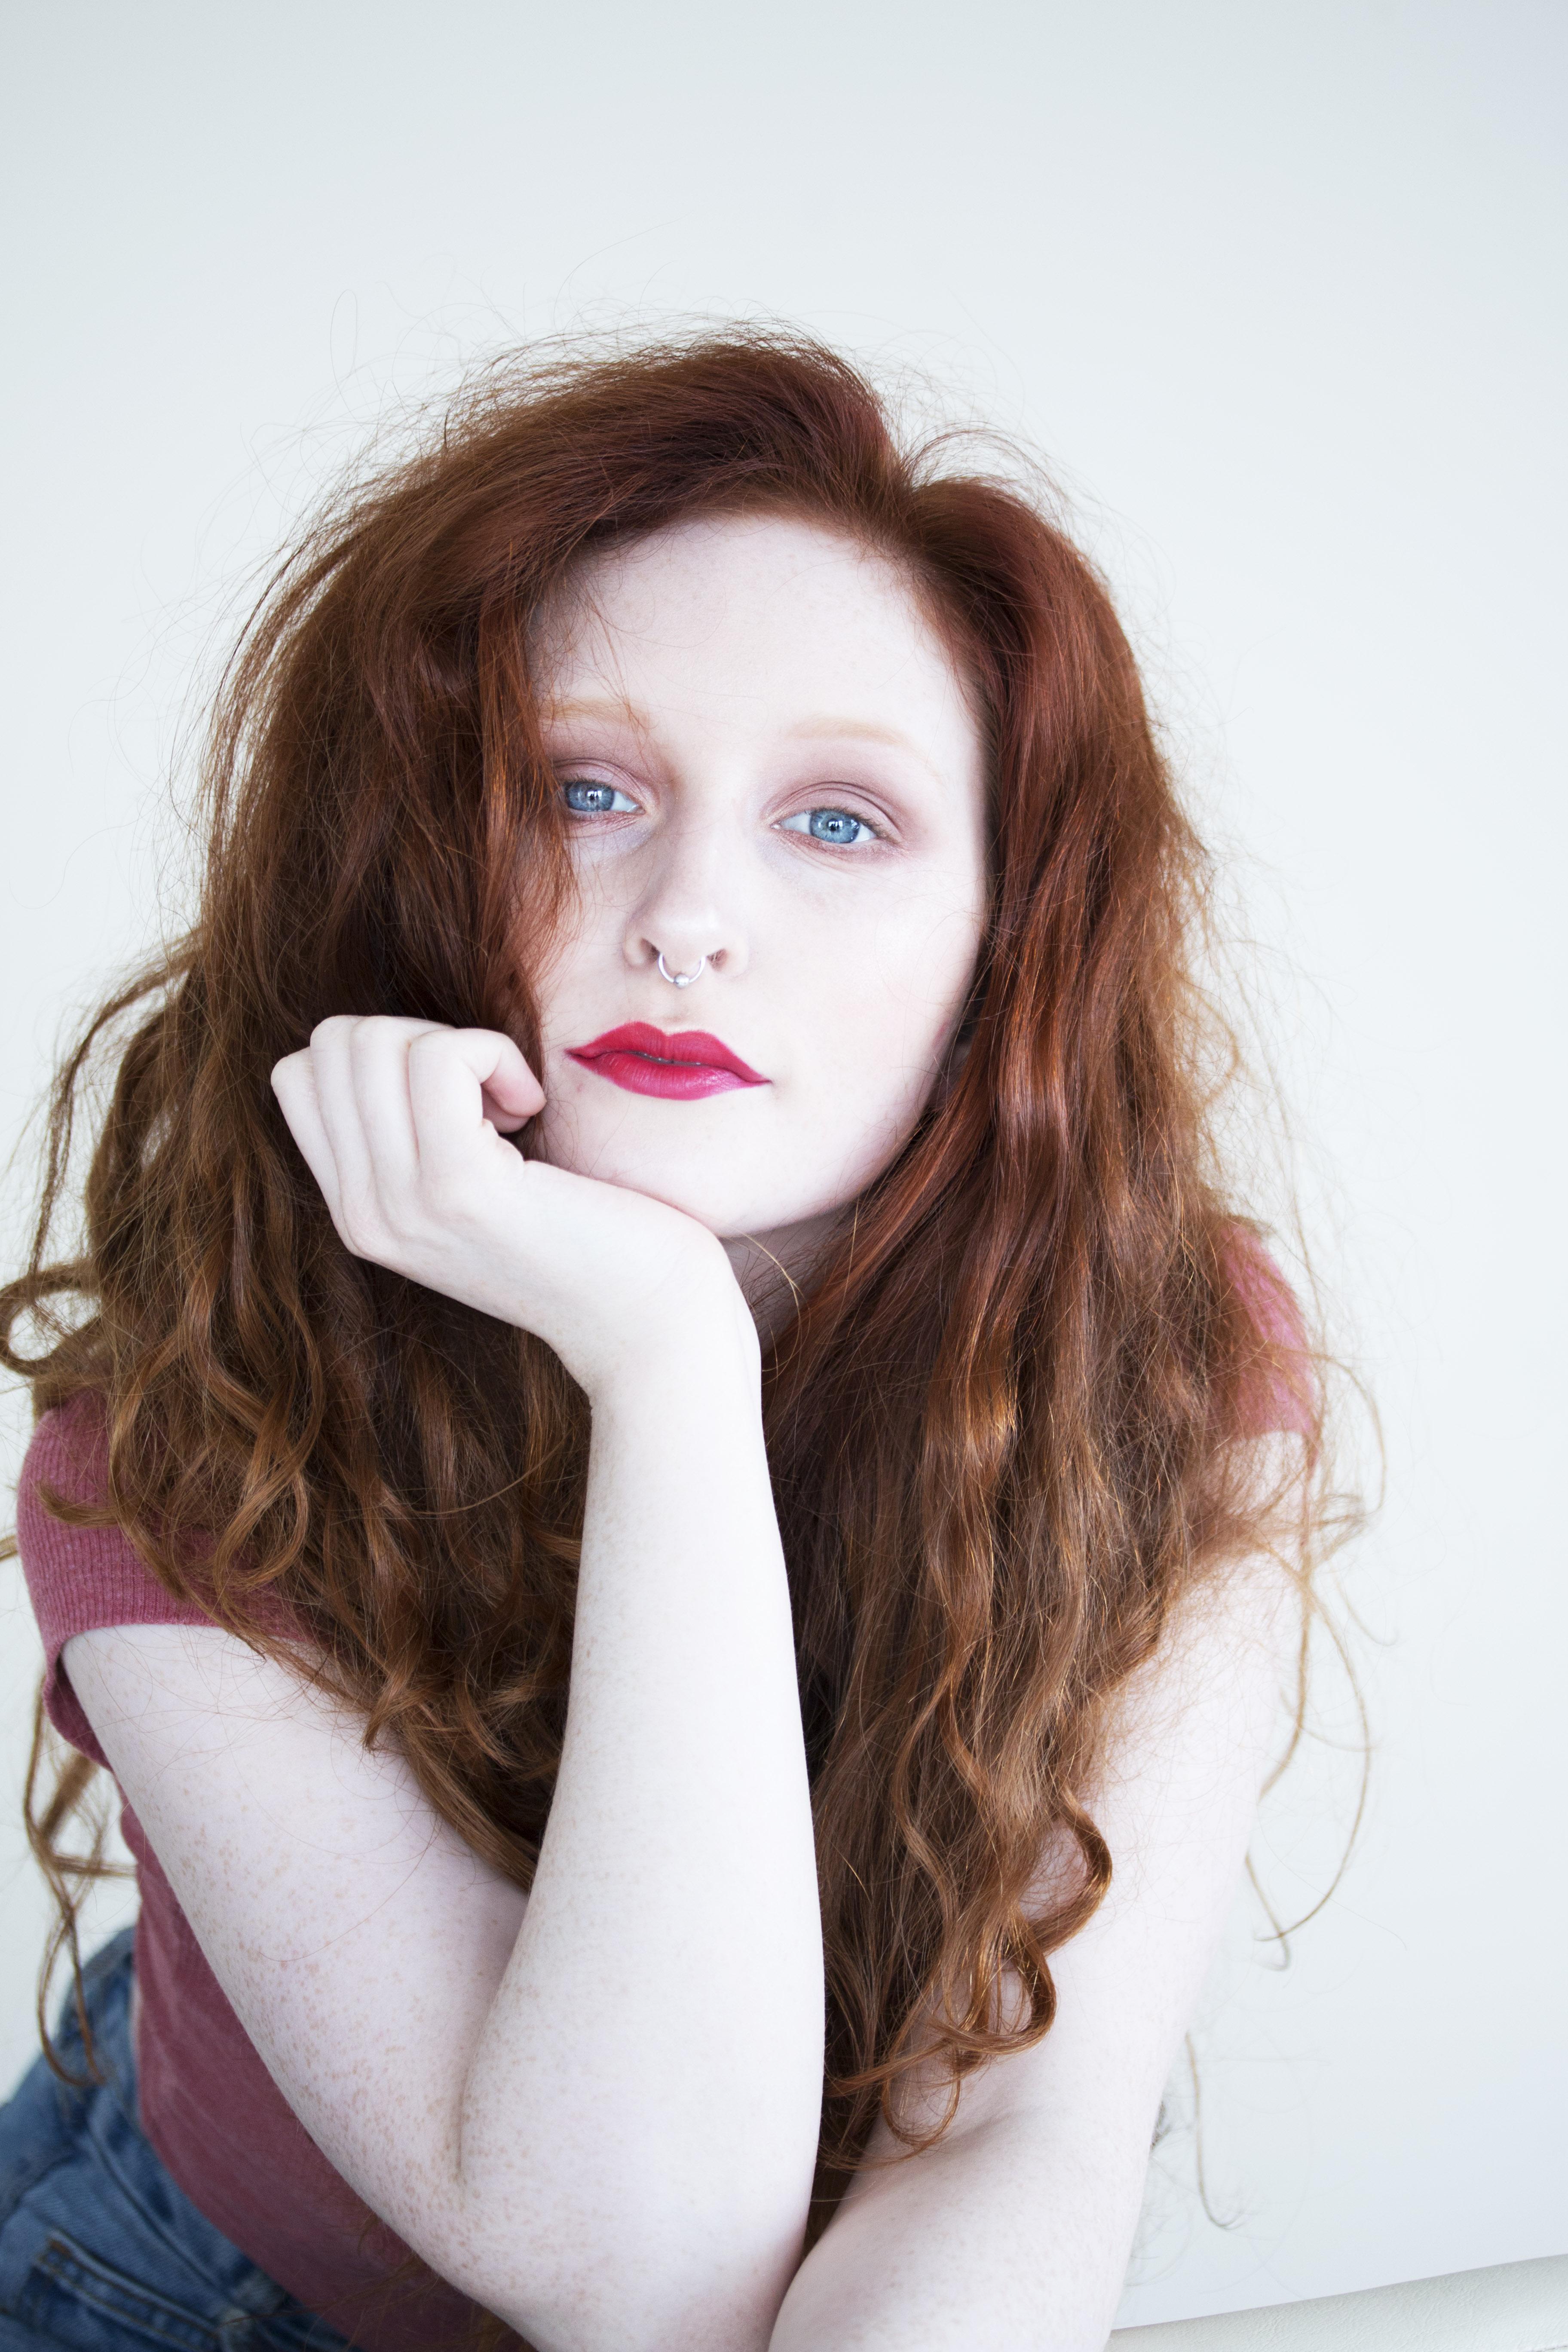 Lucy O'Sullivan